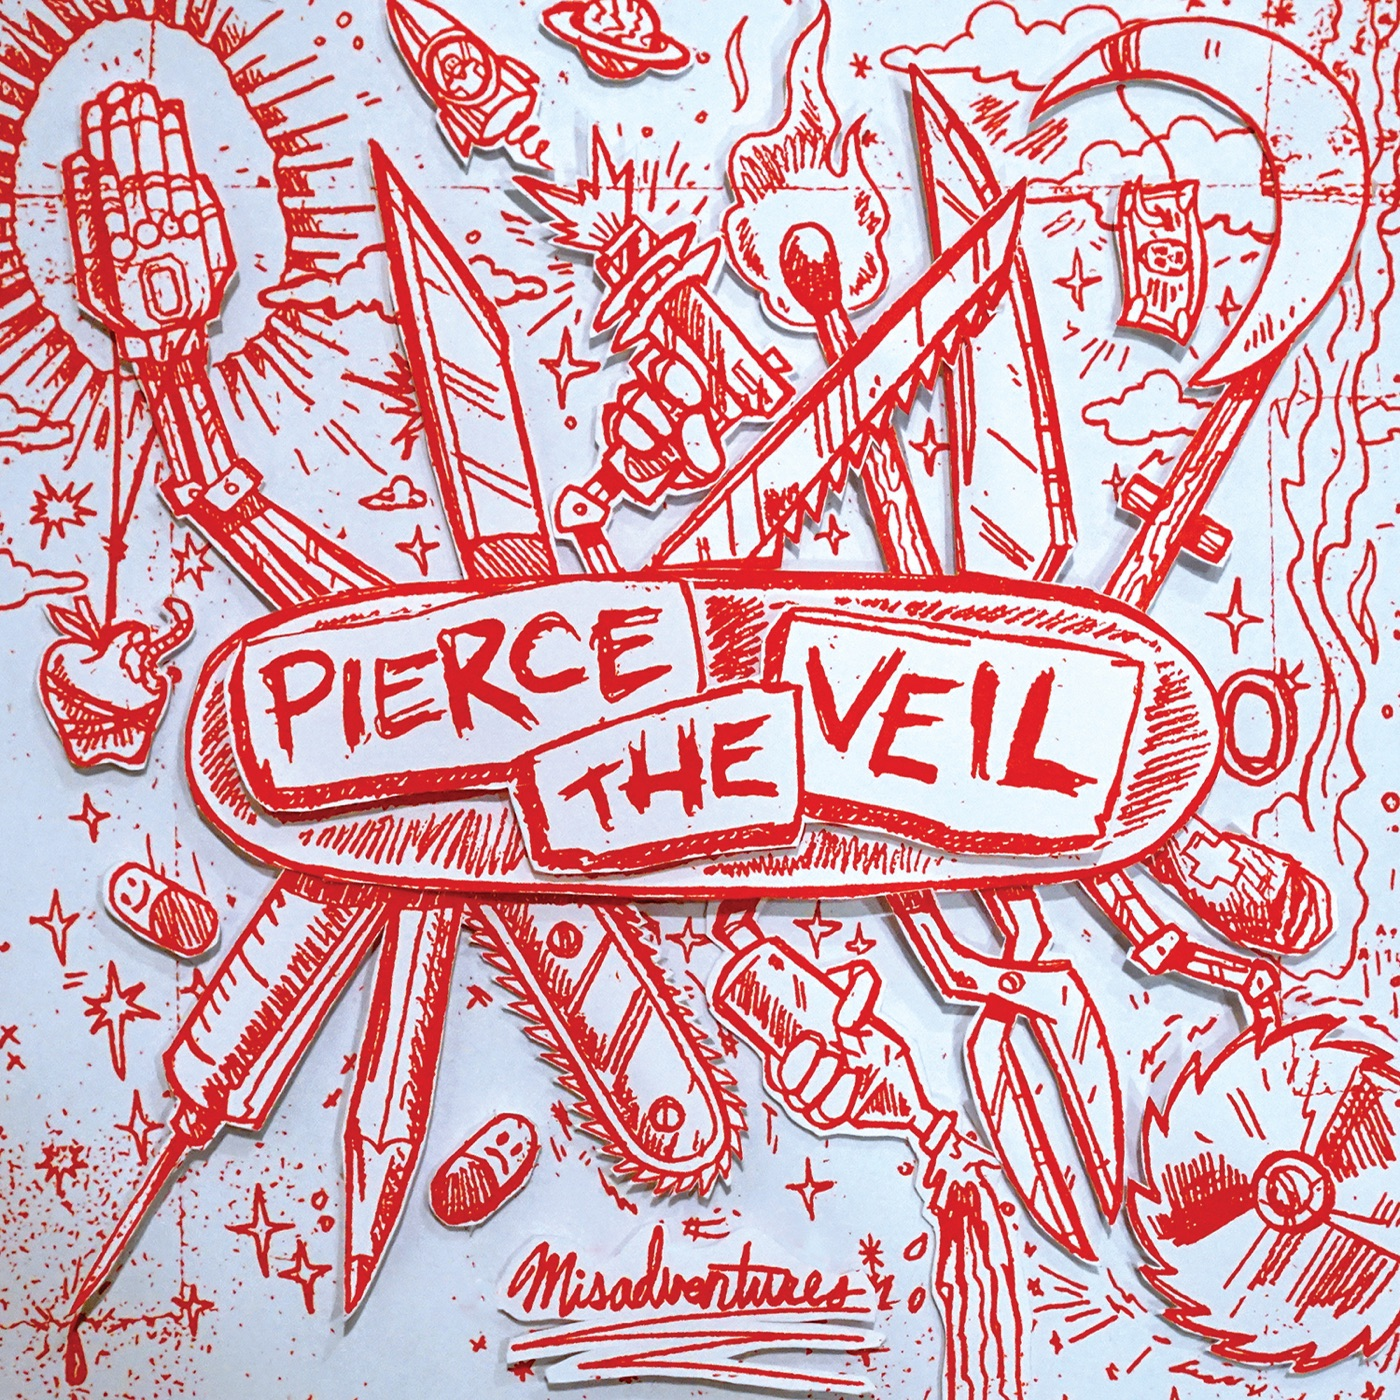 Pierce the Veil - Circles [Single] (2016)